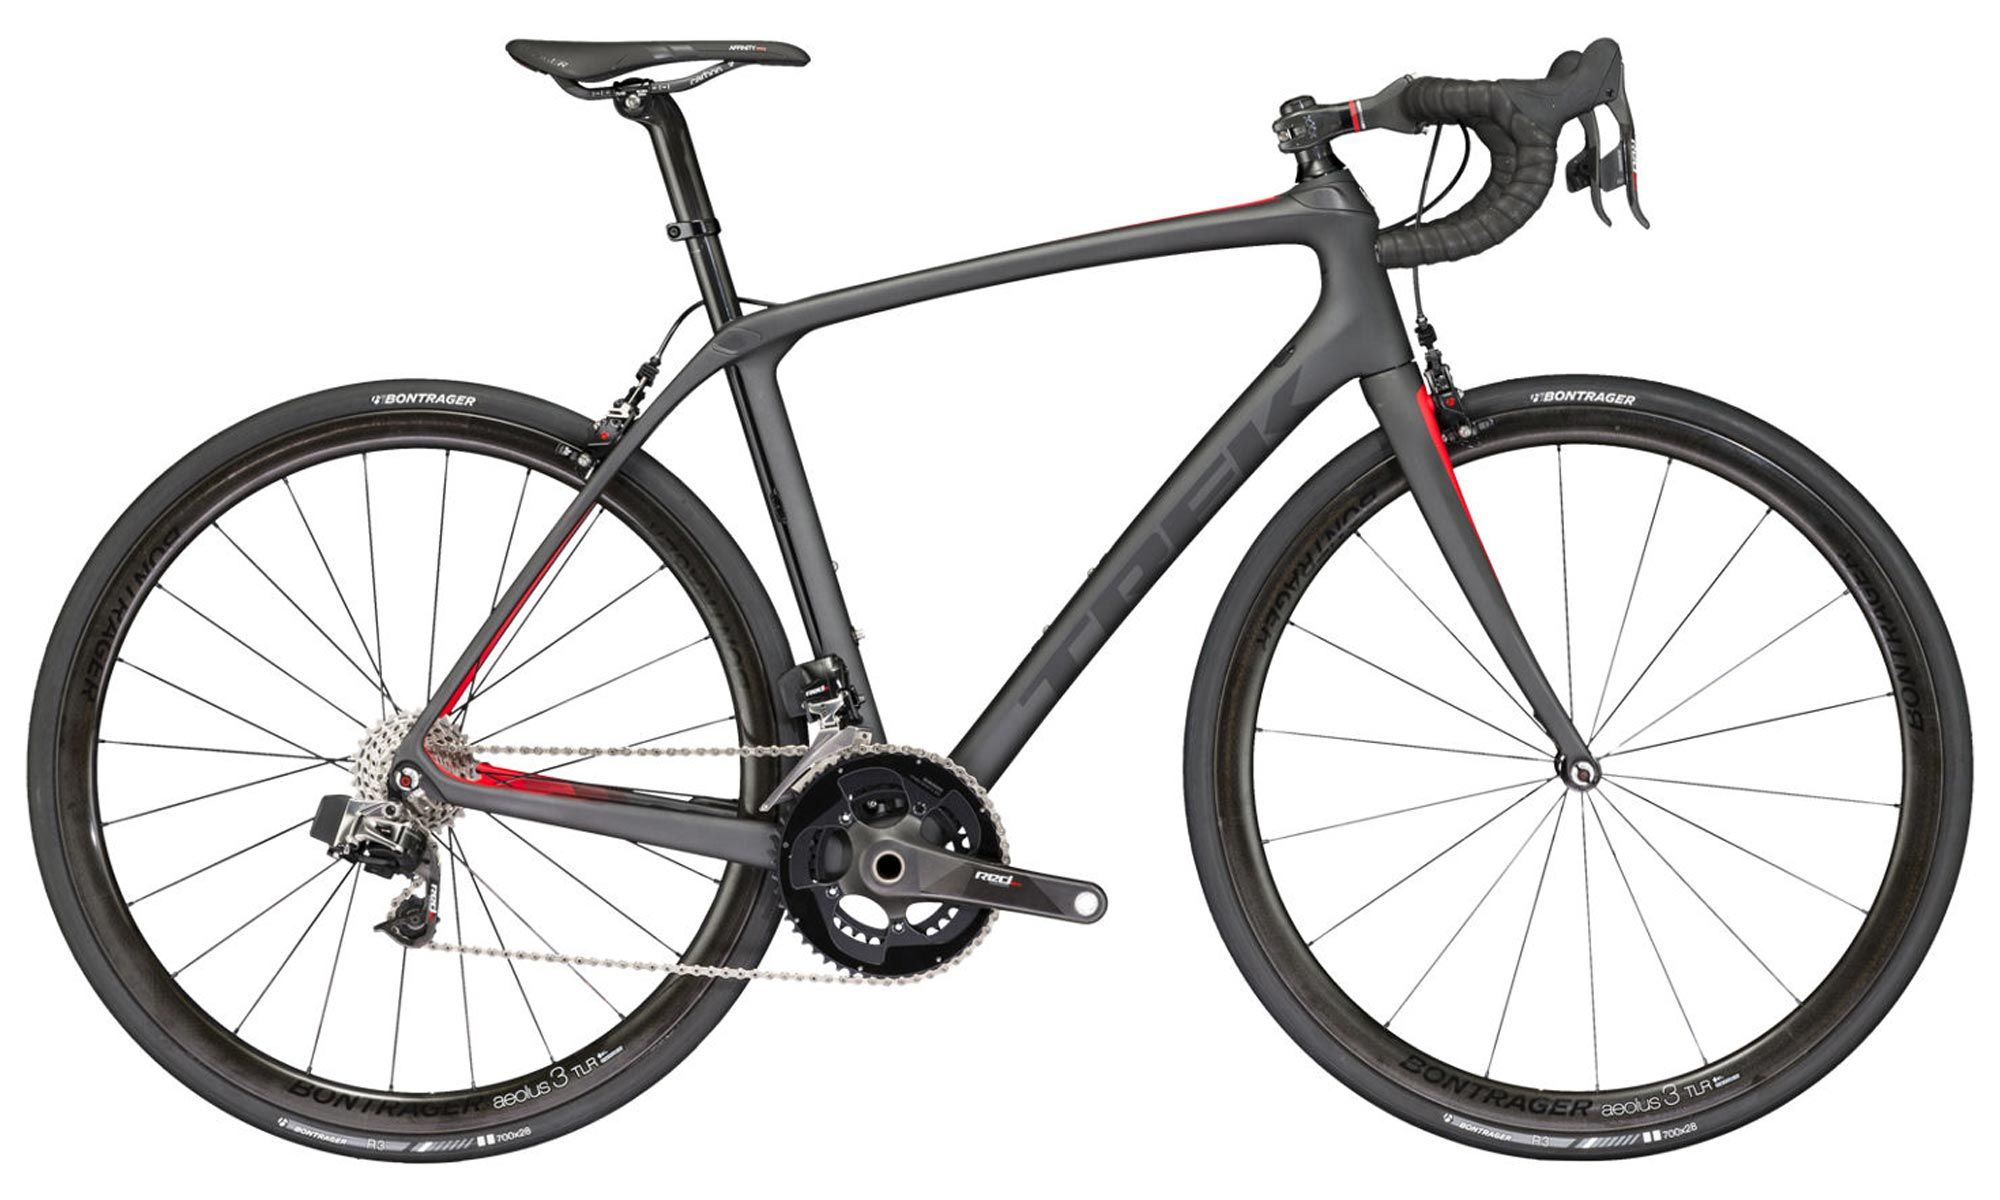 2017 Trek Domane Slr 9 Etap Endurance Carbon Road Bike Trek Bikes Trek Road Bikes Carbon Road Bike